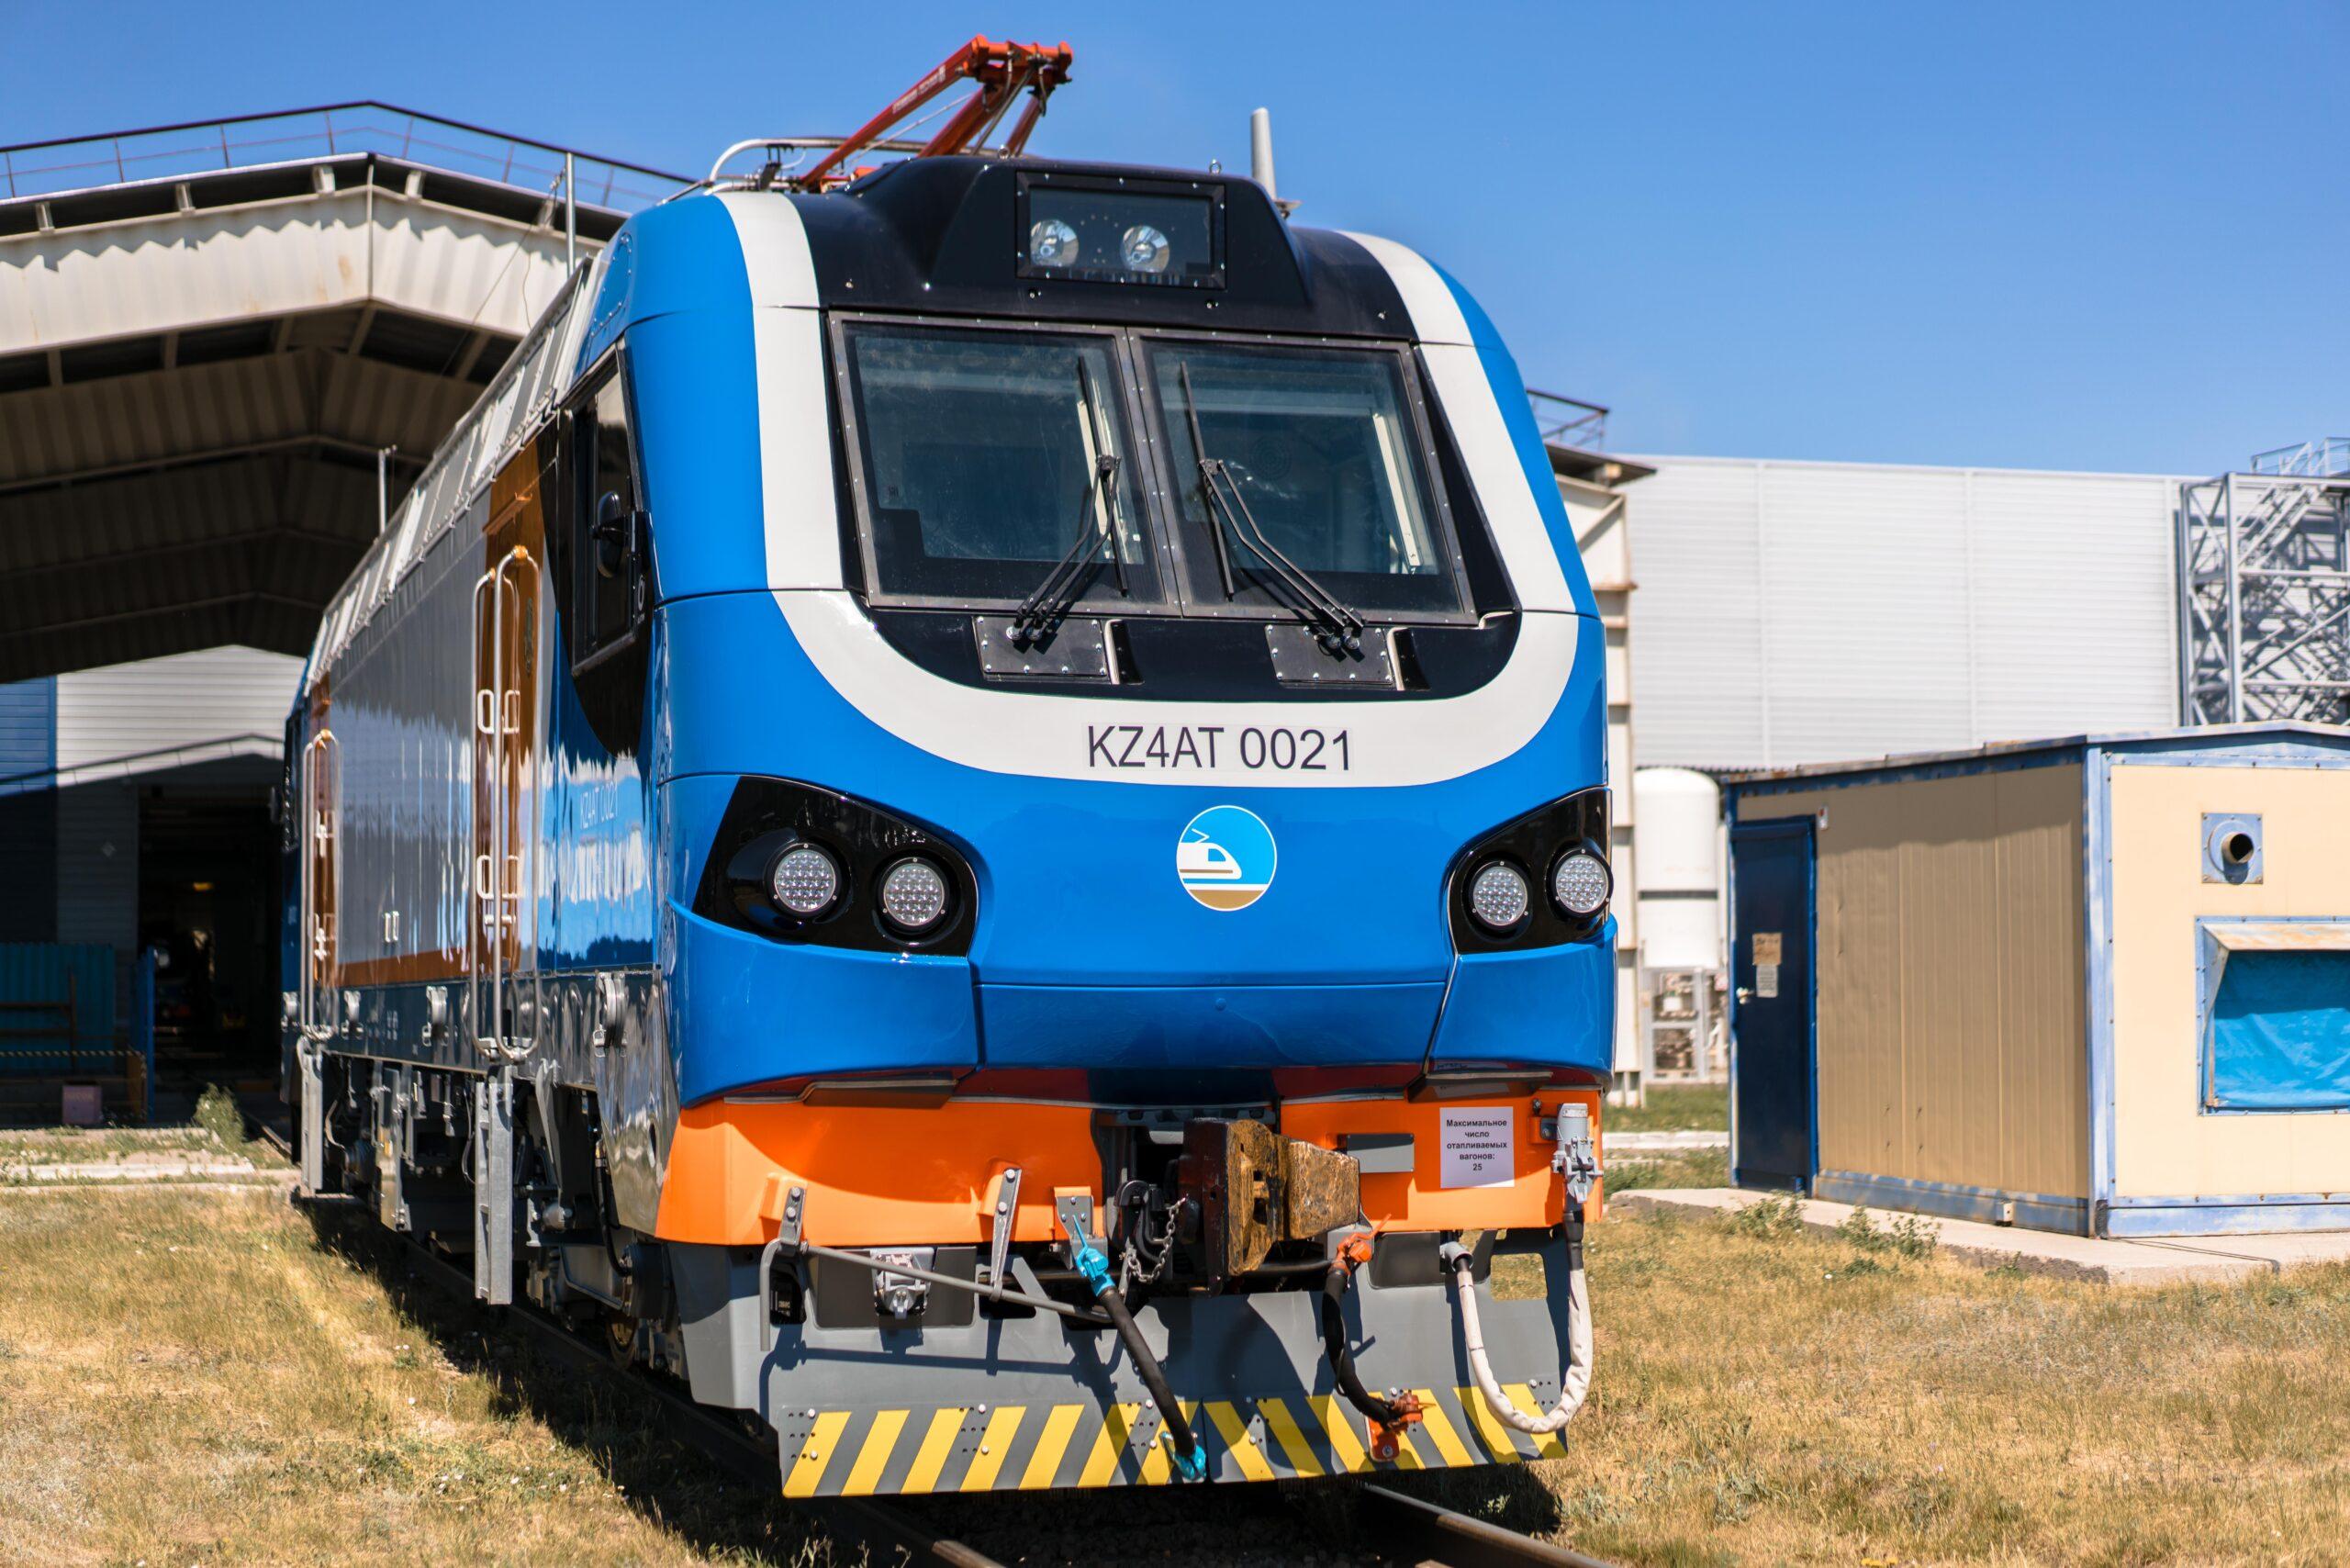 First Alstom Prima electric passenger locomotive fully assembled in Kazakhstan